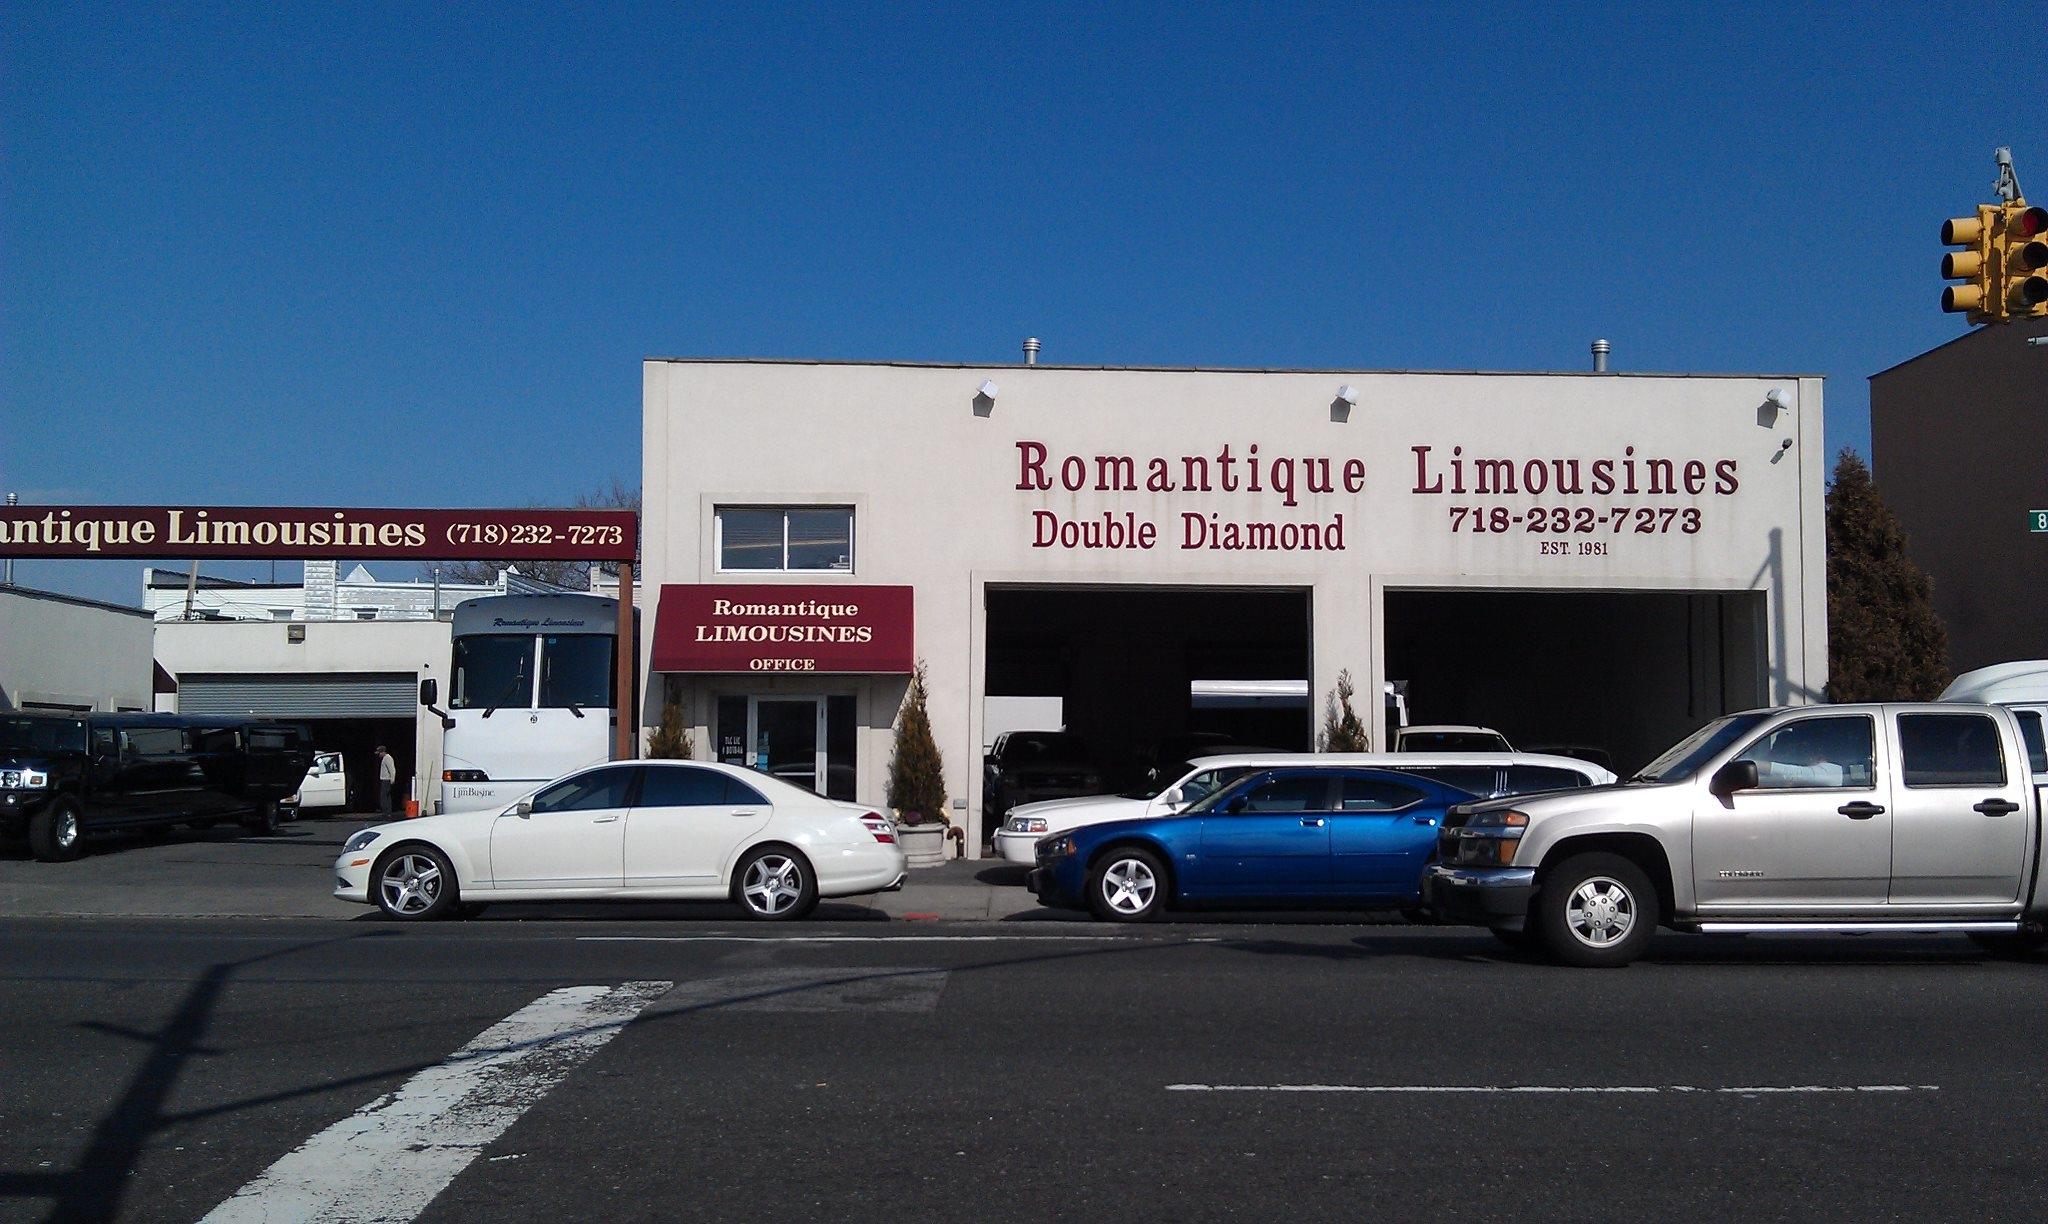 Romantique Limousines Staten Island